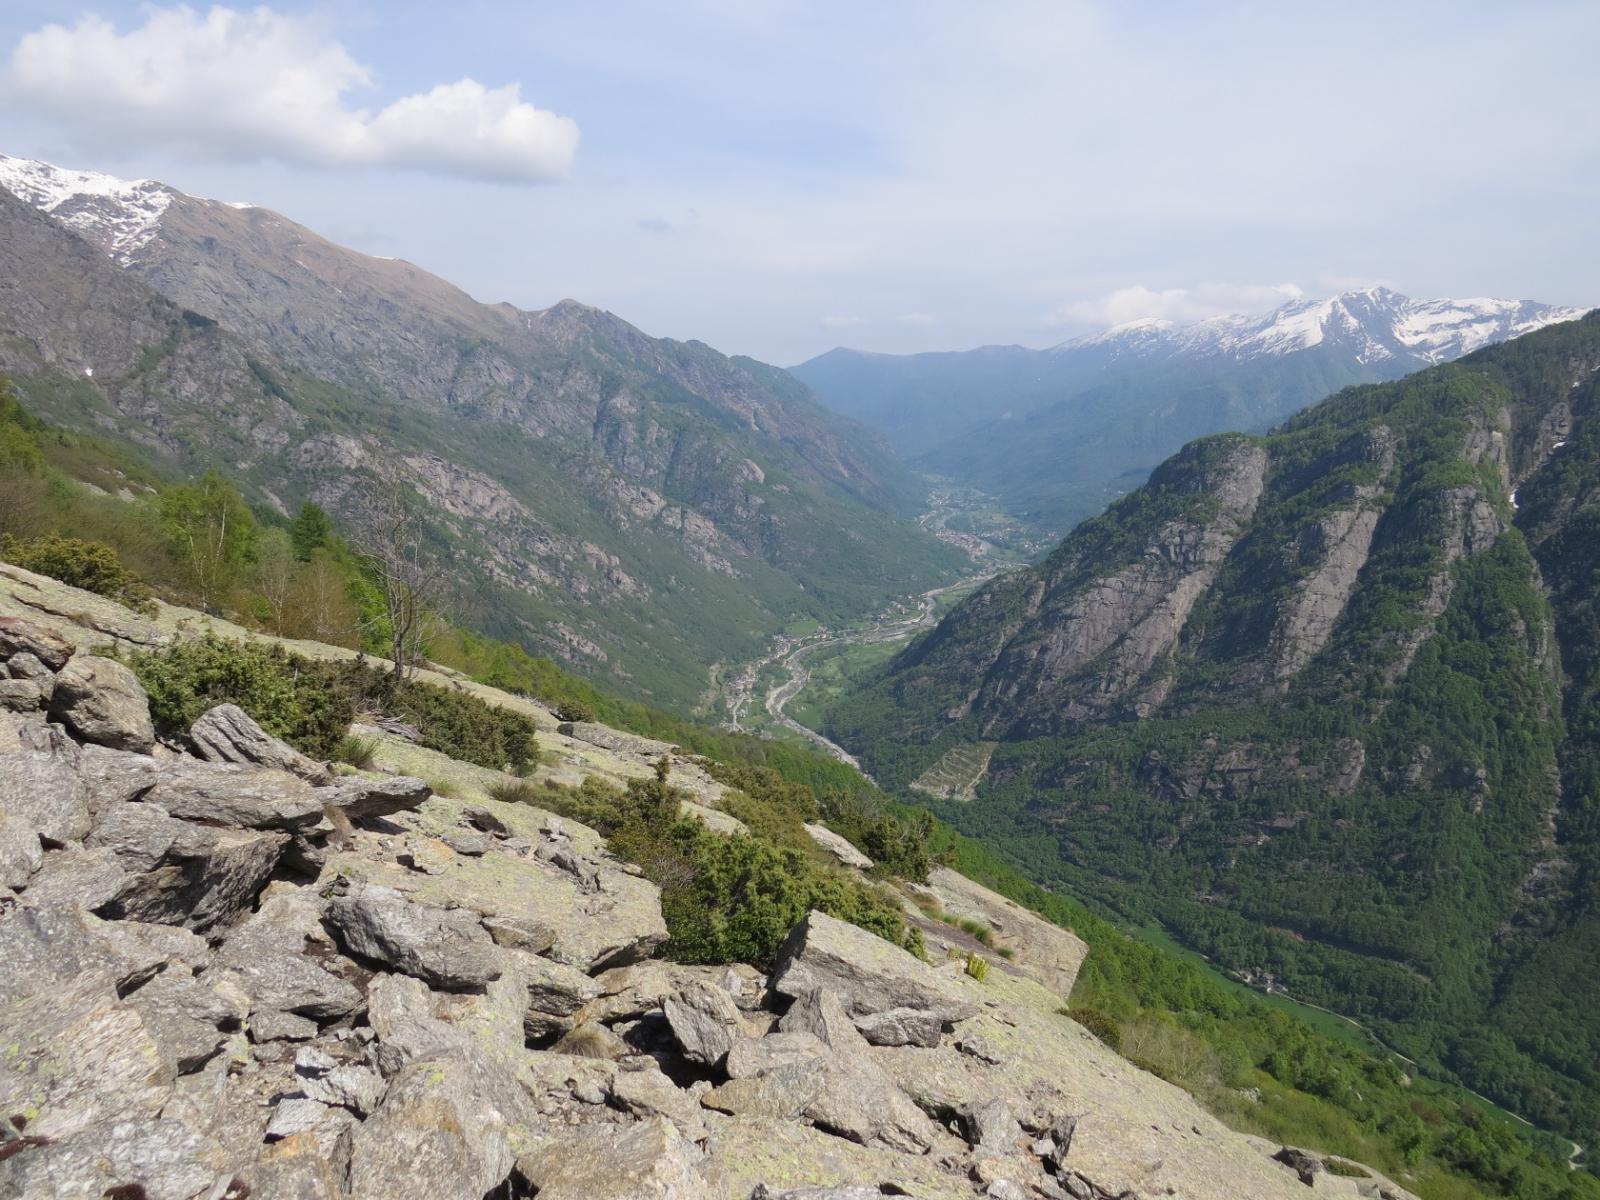 Vista sulla bassa valle